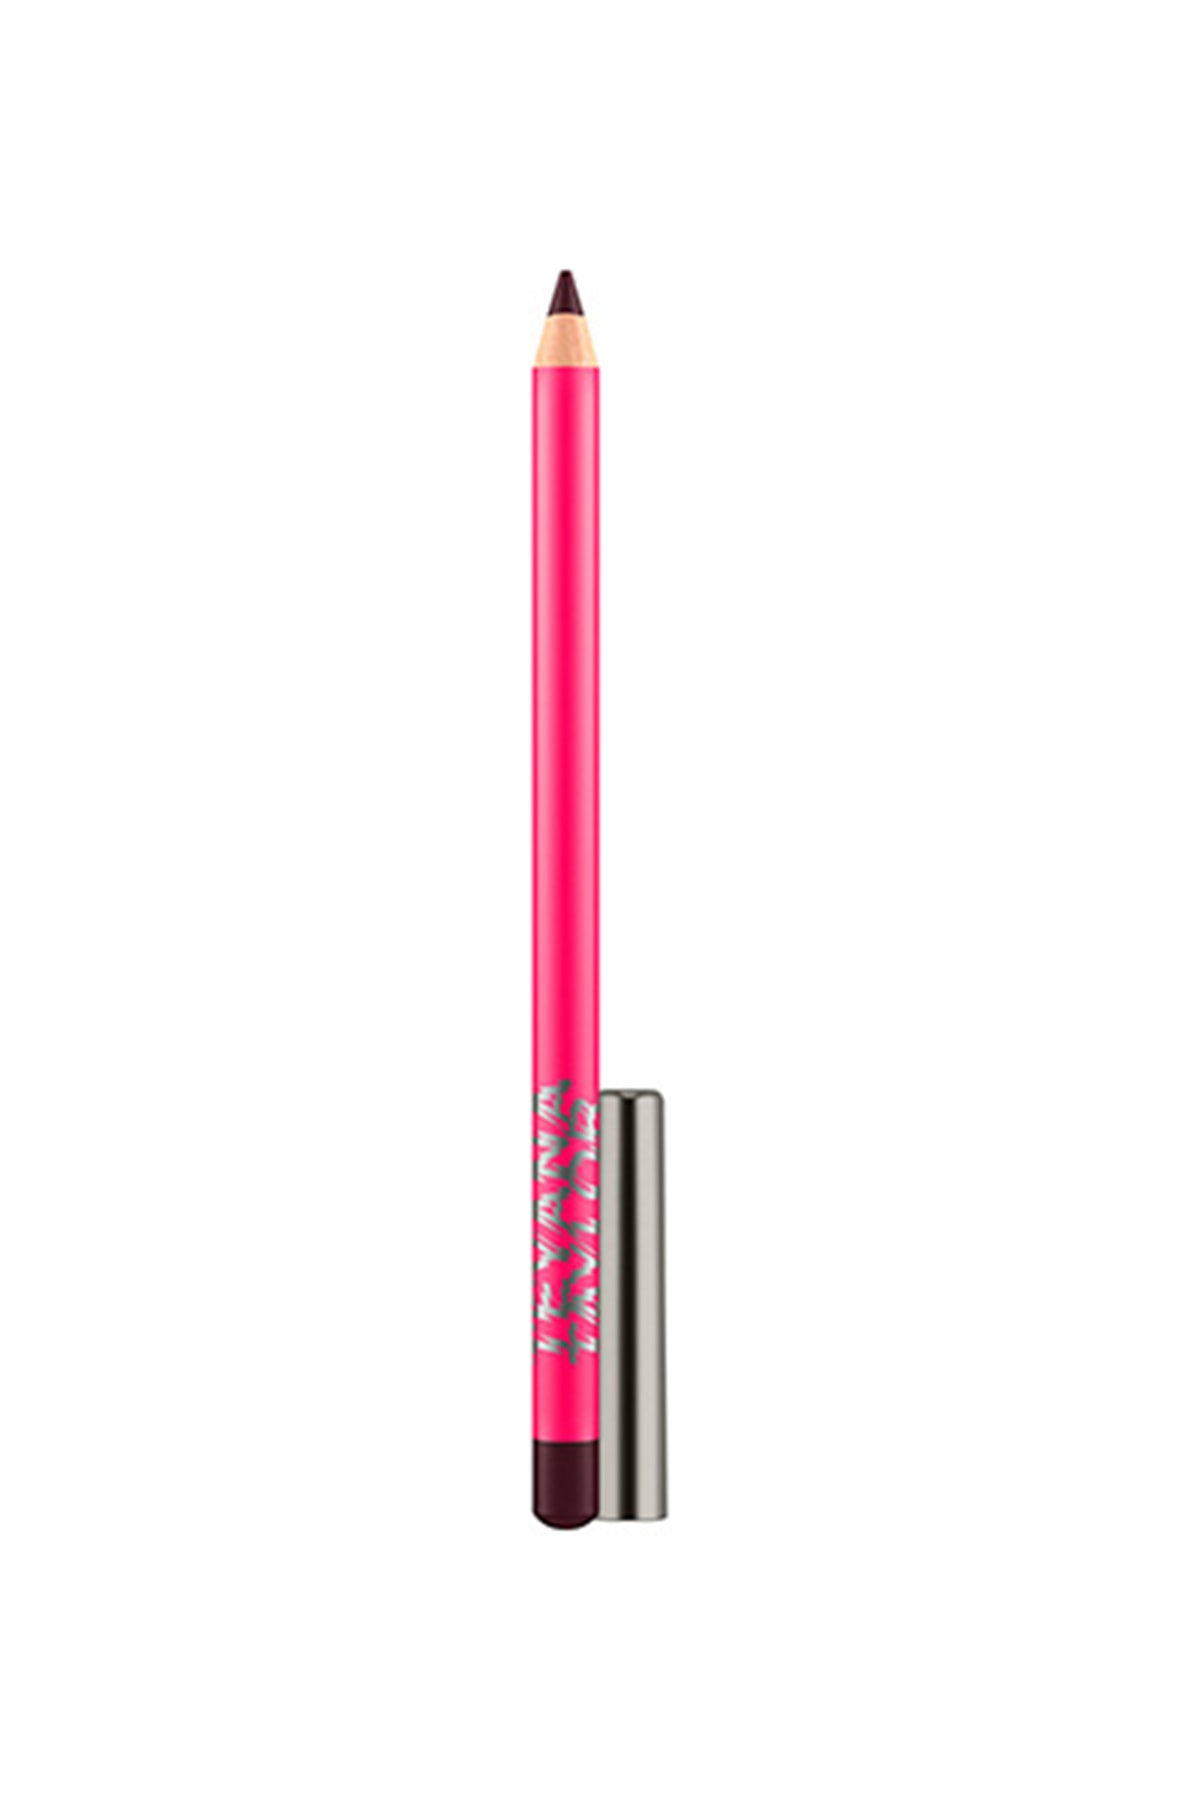 M.A.C Dudak Kalemi - Lip Pencil Teyana Taylor Nightmoth 773602582761